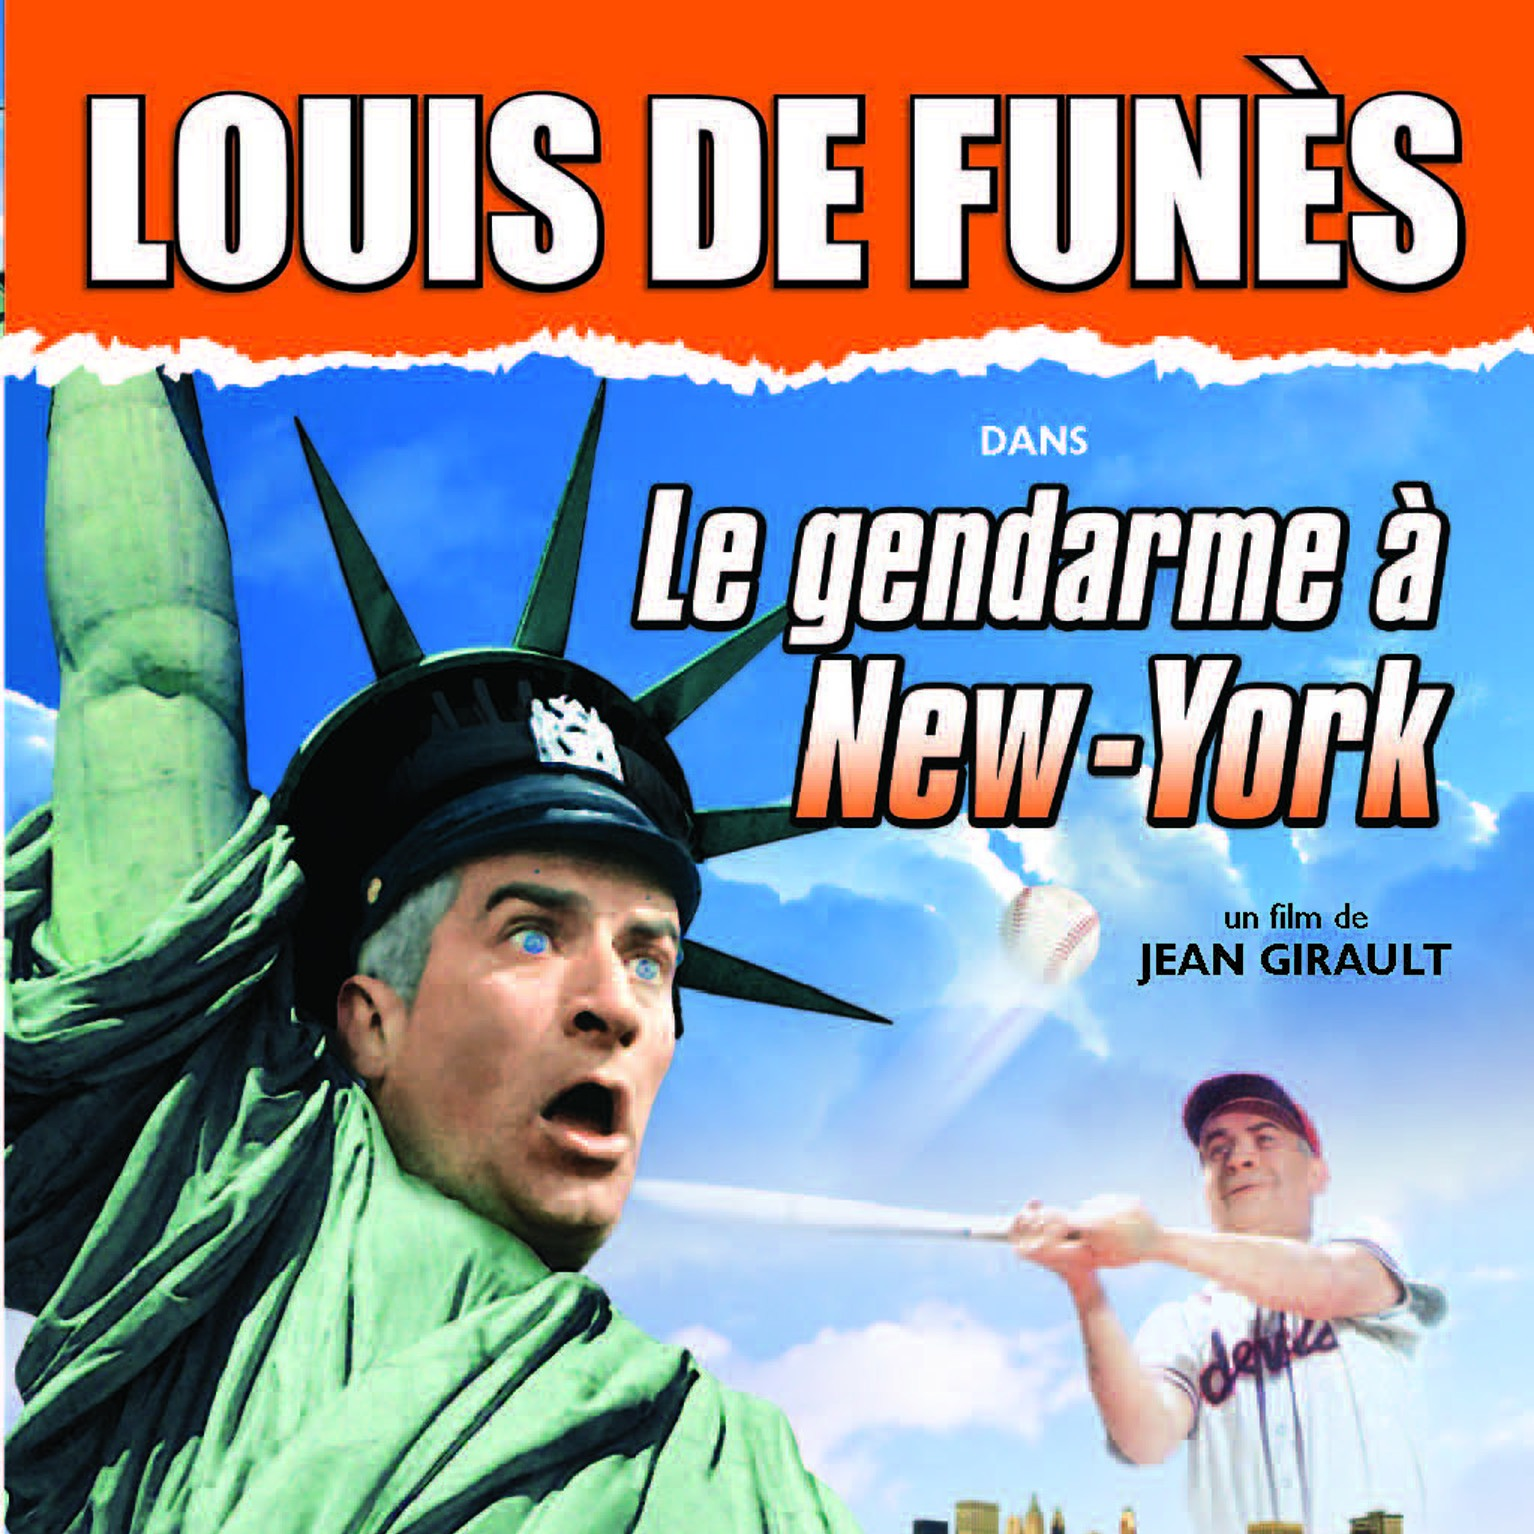 LE GENDARME A NEW-YORK | Saga Louis De Funès | Le podcast cinéma de CinéMaRadio